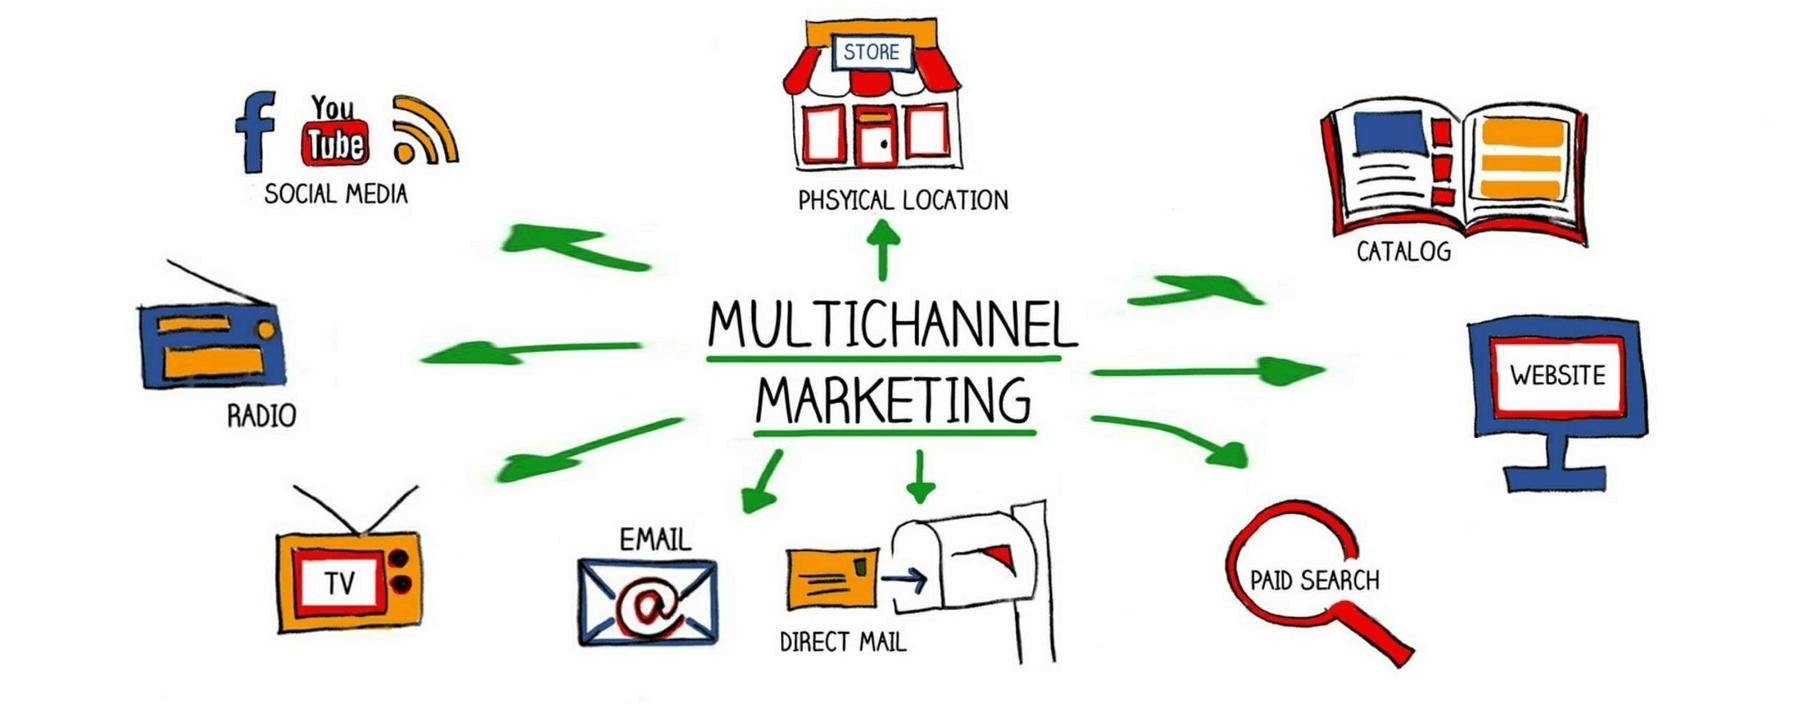 modelos marketing multicanal